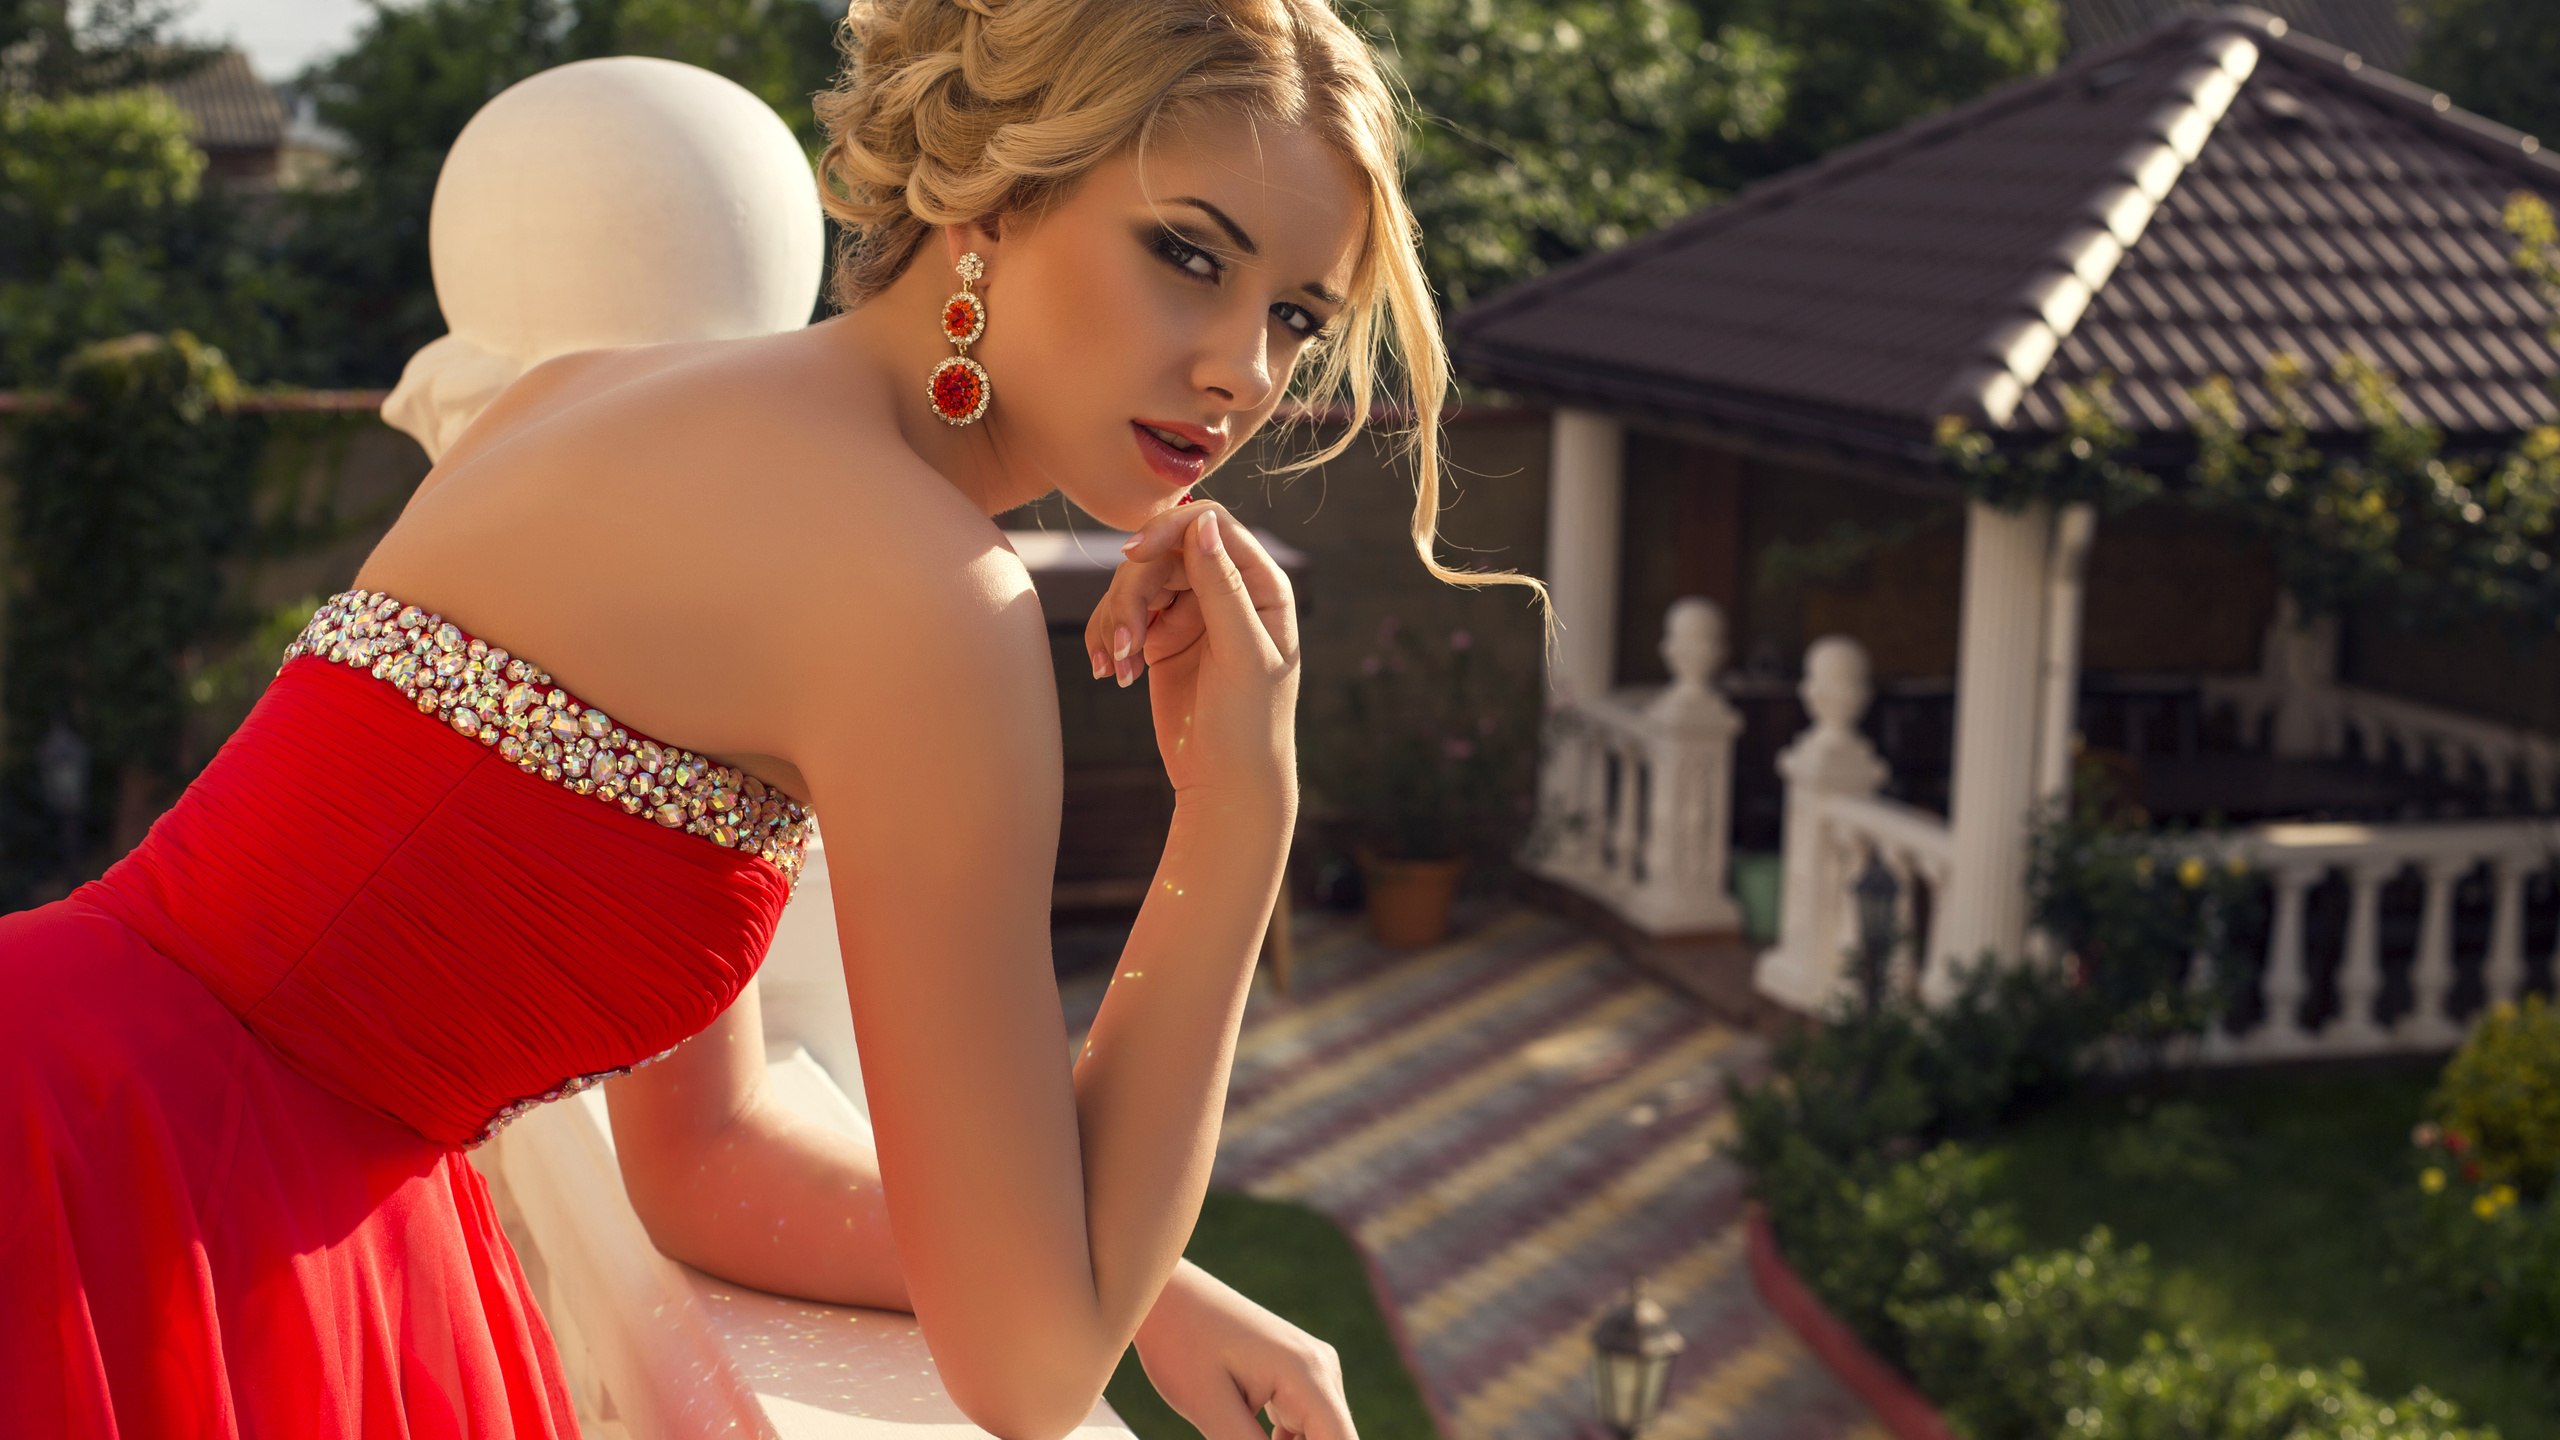 zhenshini-blondinki-v-plate-foto-seks-blondinka-negri-v-kontakte